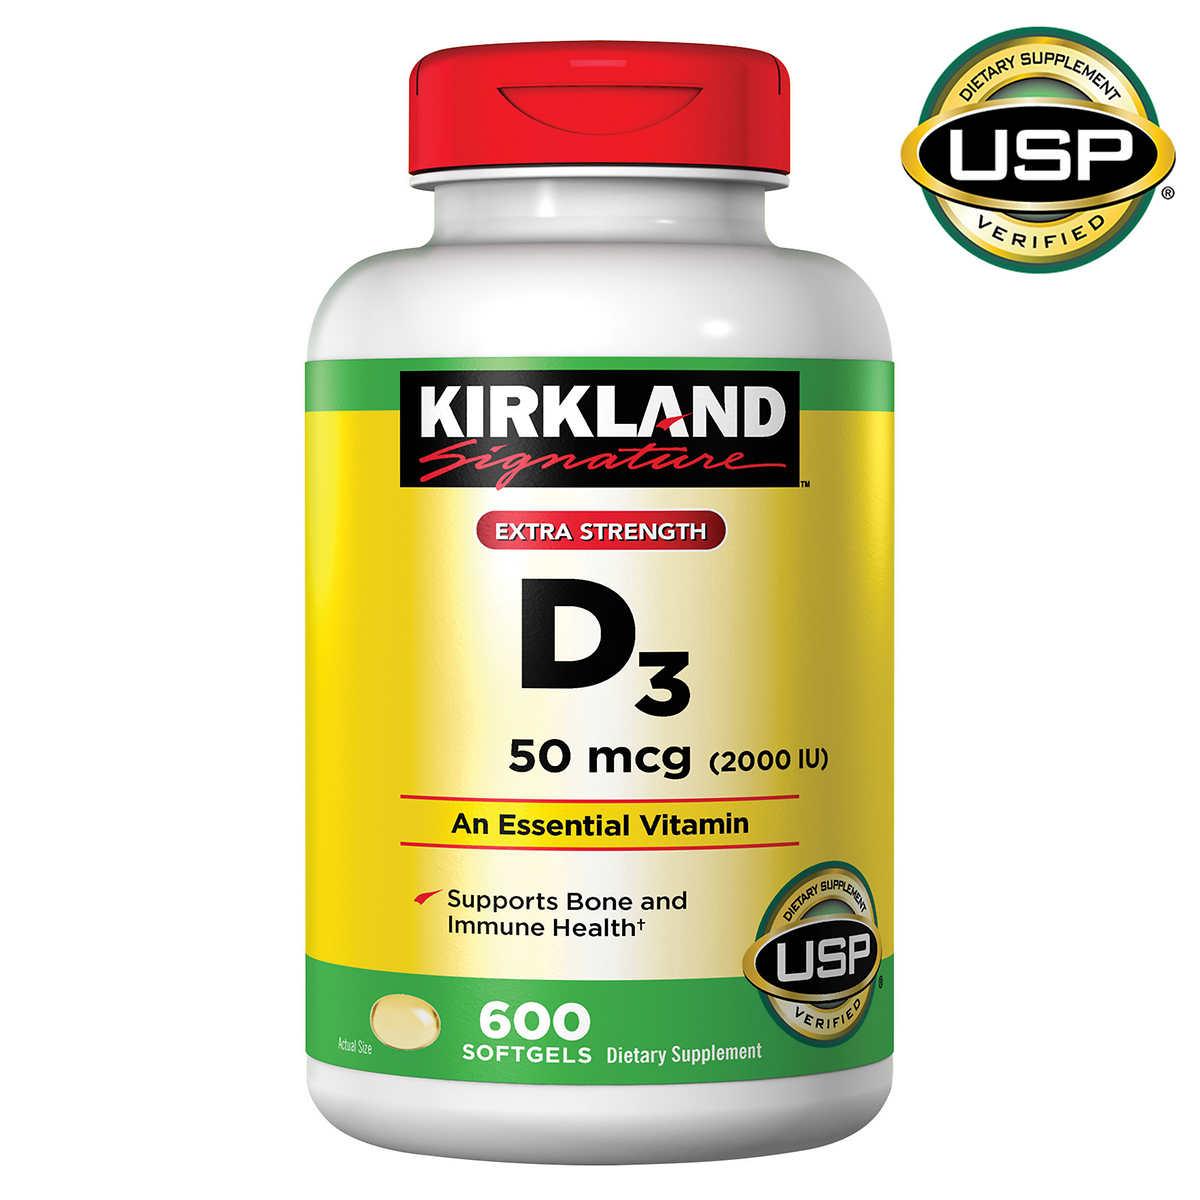 Kirkland Signature Vitamin D3 50mcg (2000 IU) - Вітамін D3 50mcg (2000 IU) (600табл.)